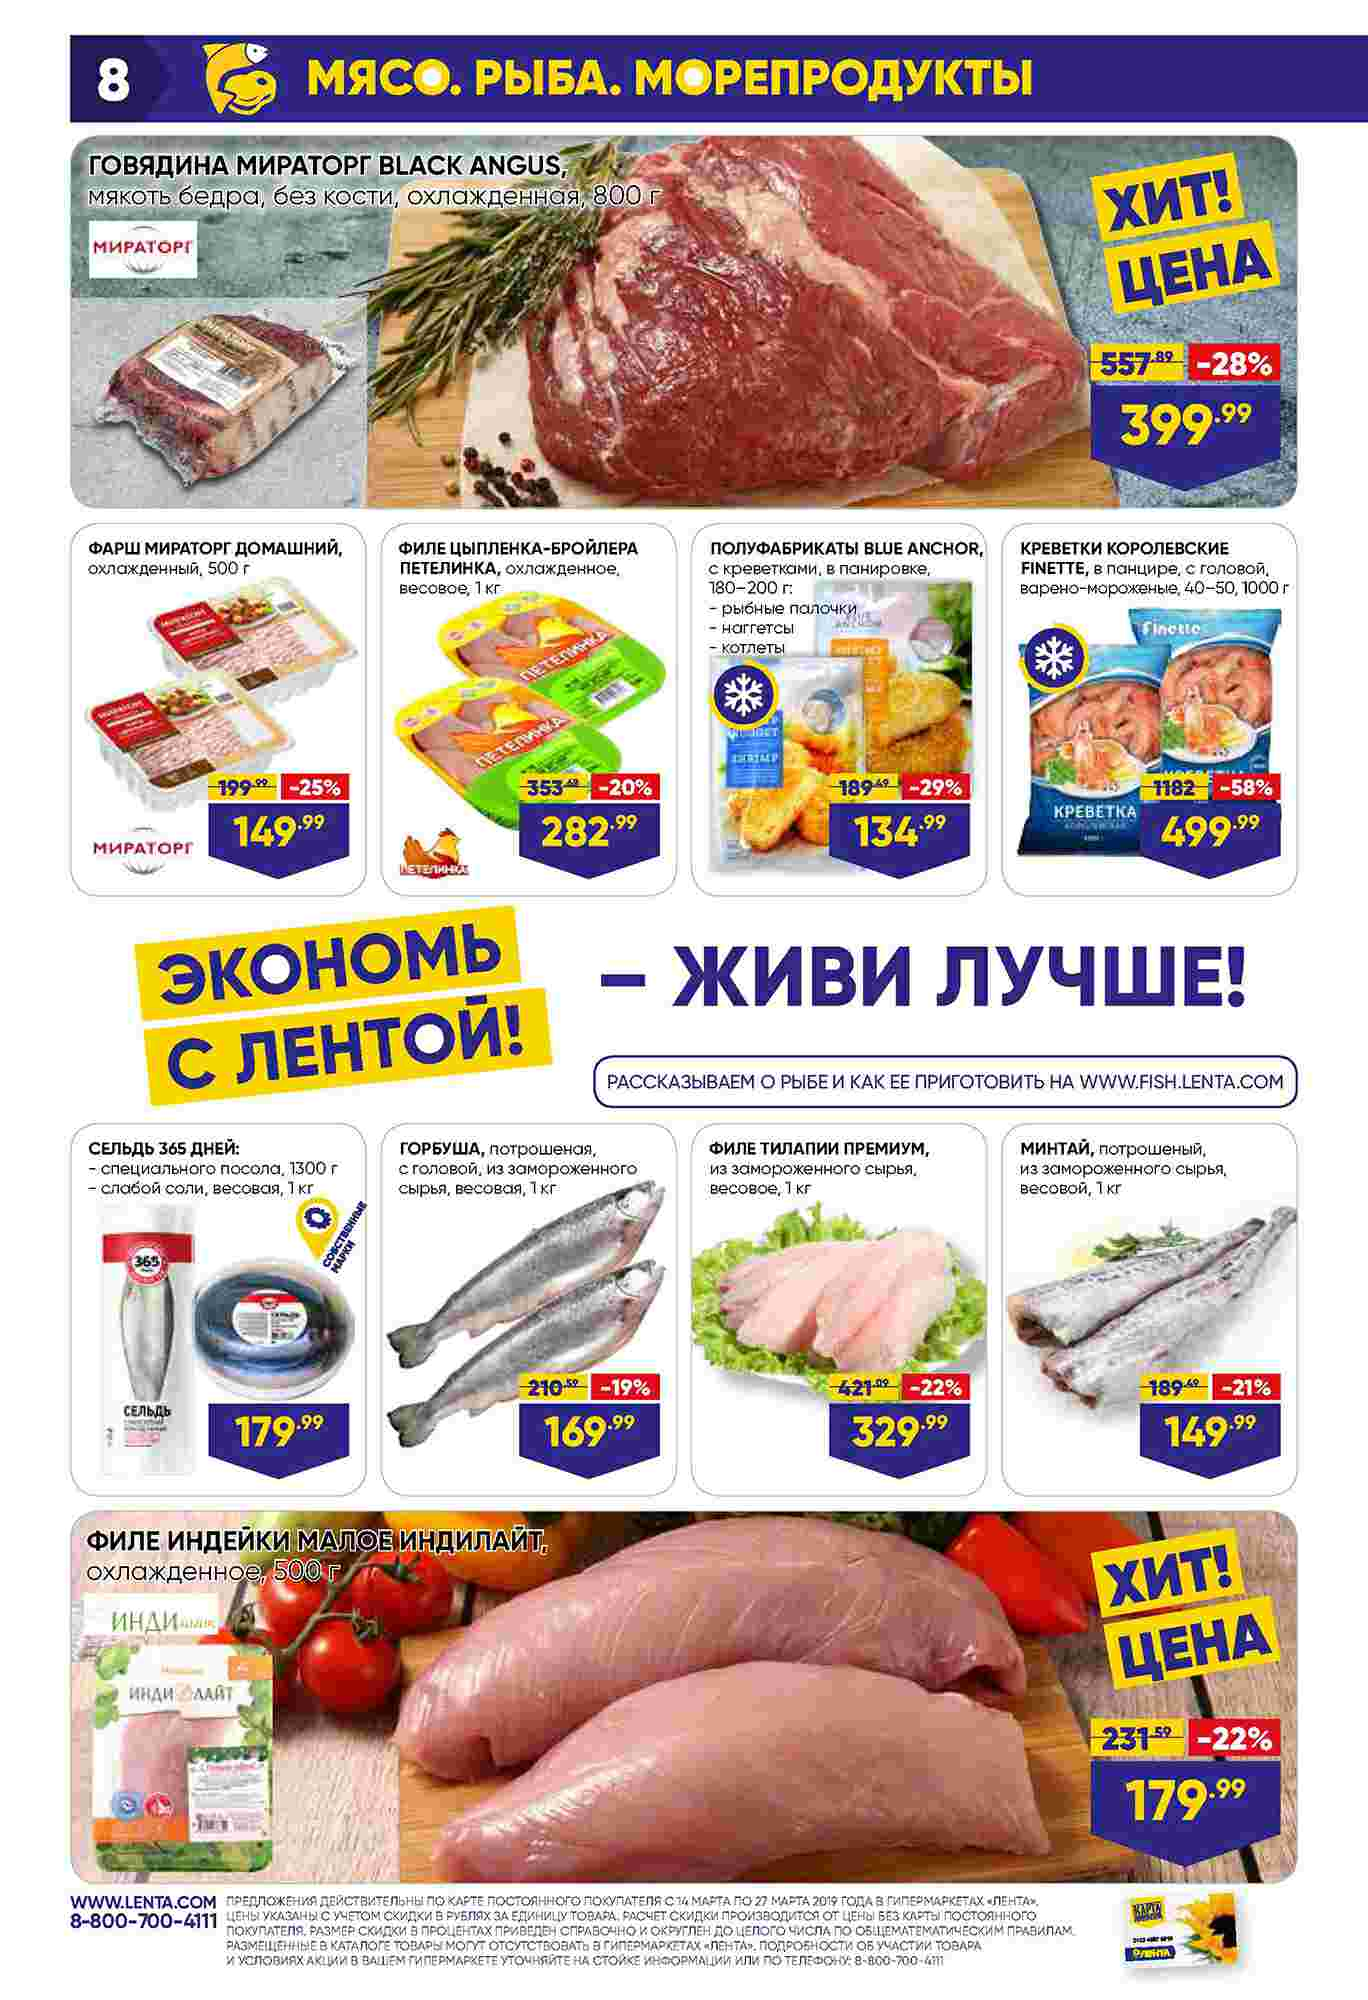 Каталог Лента гипермаркет 14-27.03.2019 стр. - 0001 - 0008